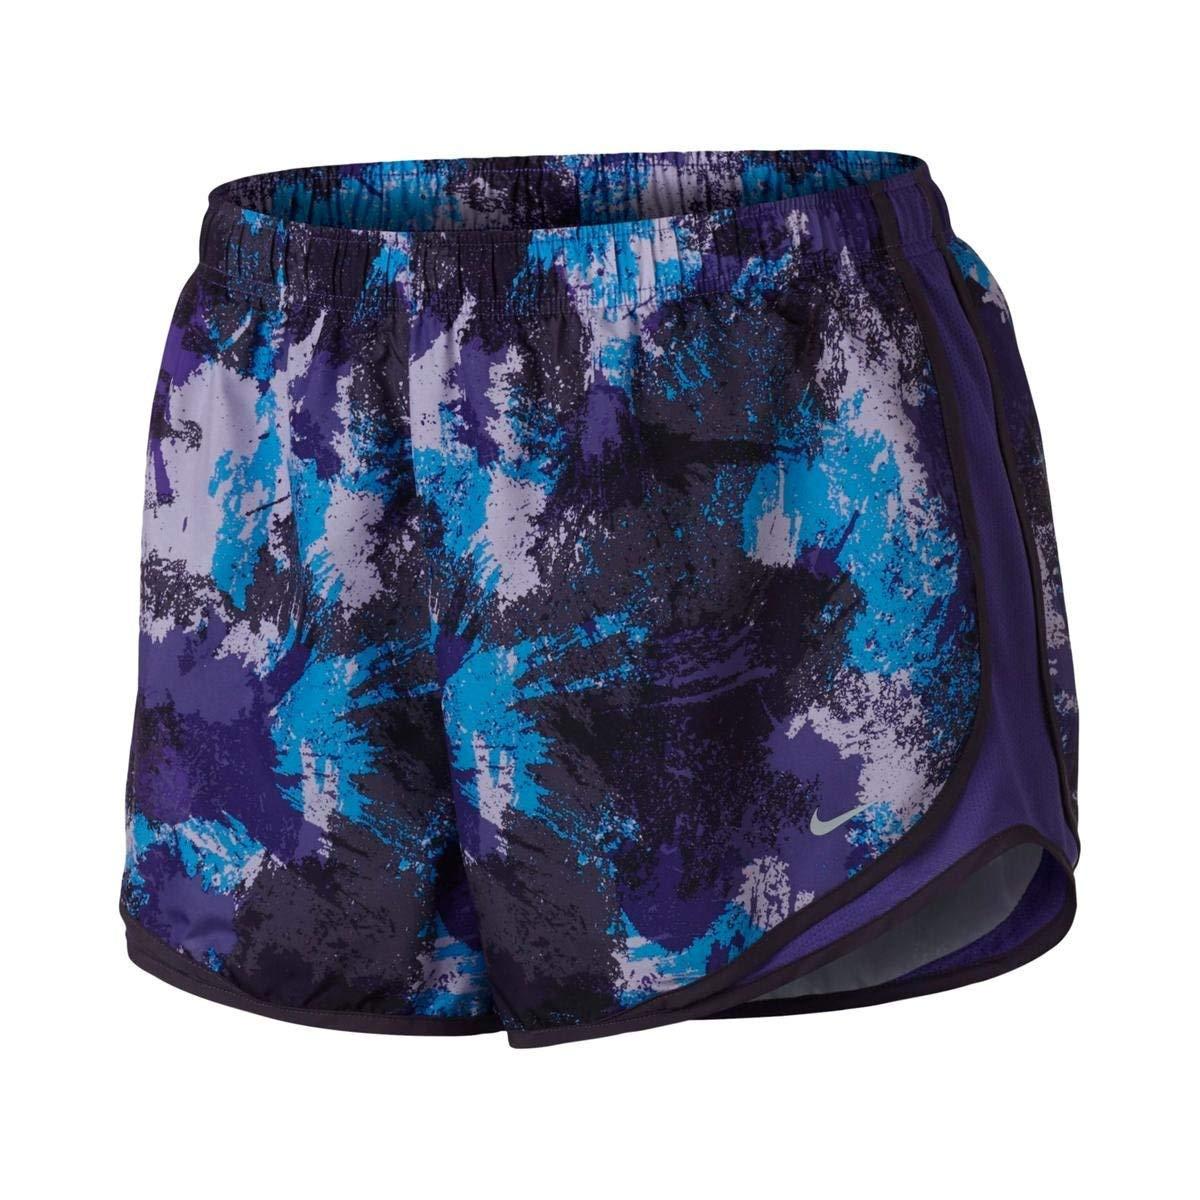 87861fdd28 Amazon.com  Nike Women s Plus Size Chalkdust Printed Tempo Shorts  Sports    Outdoors